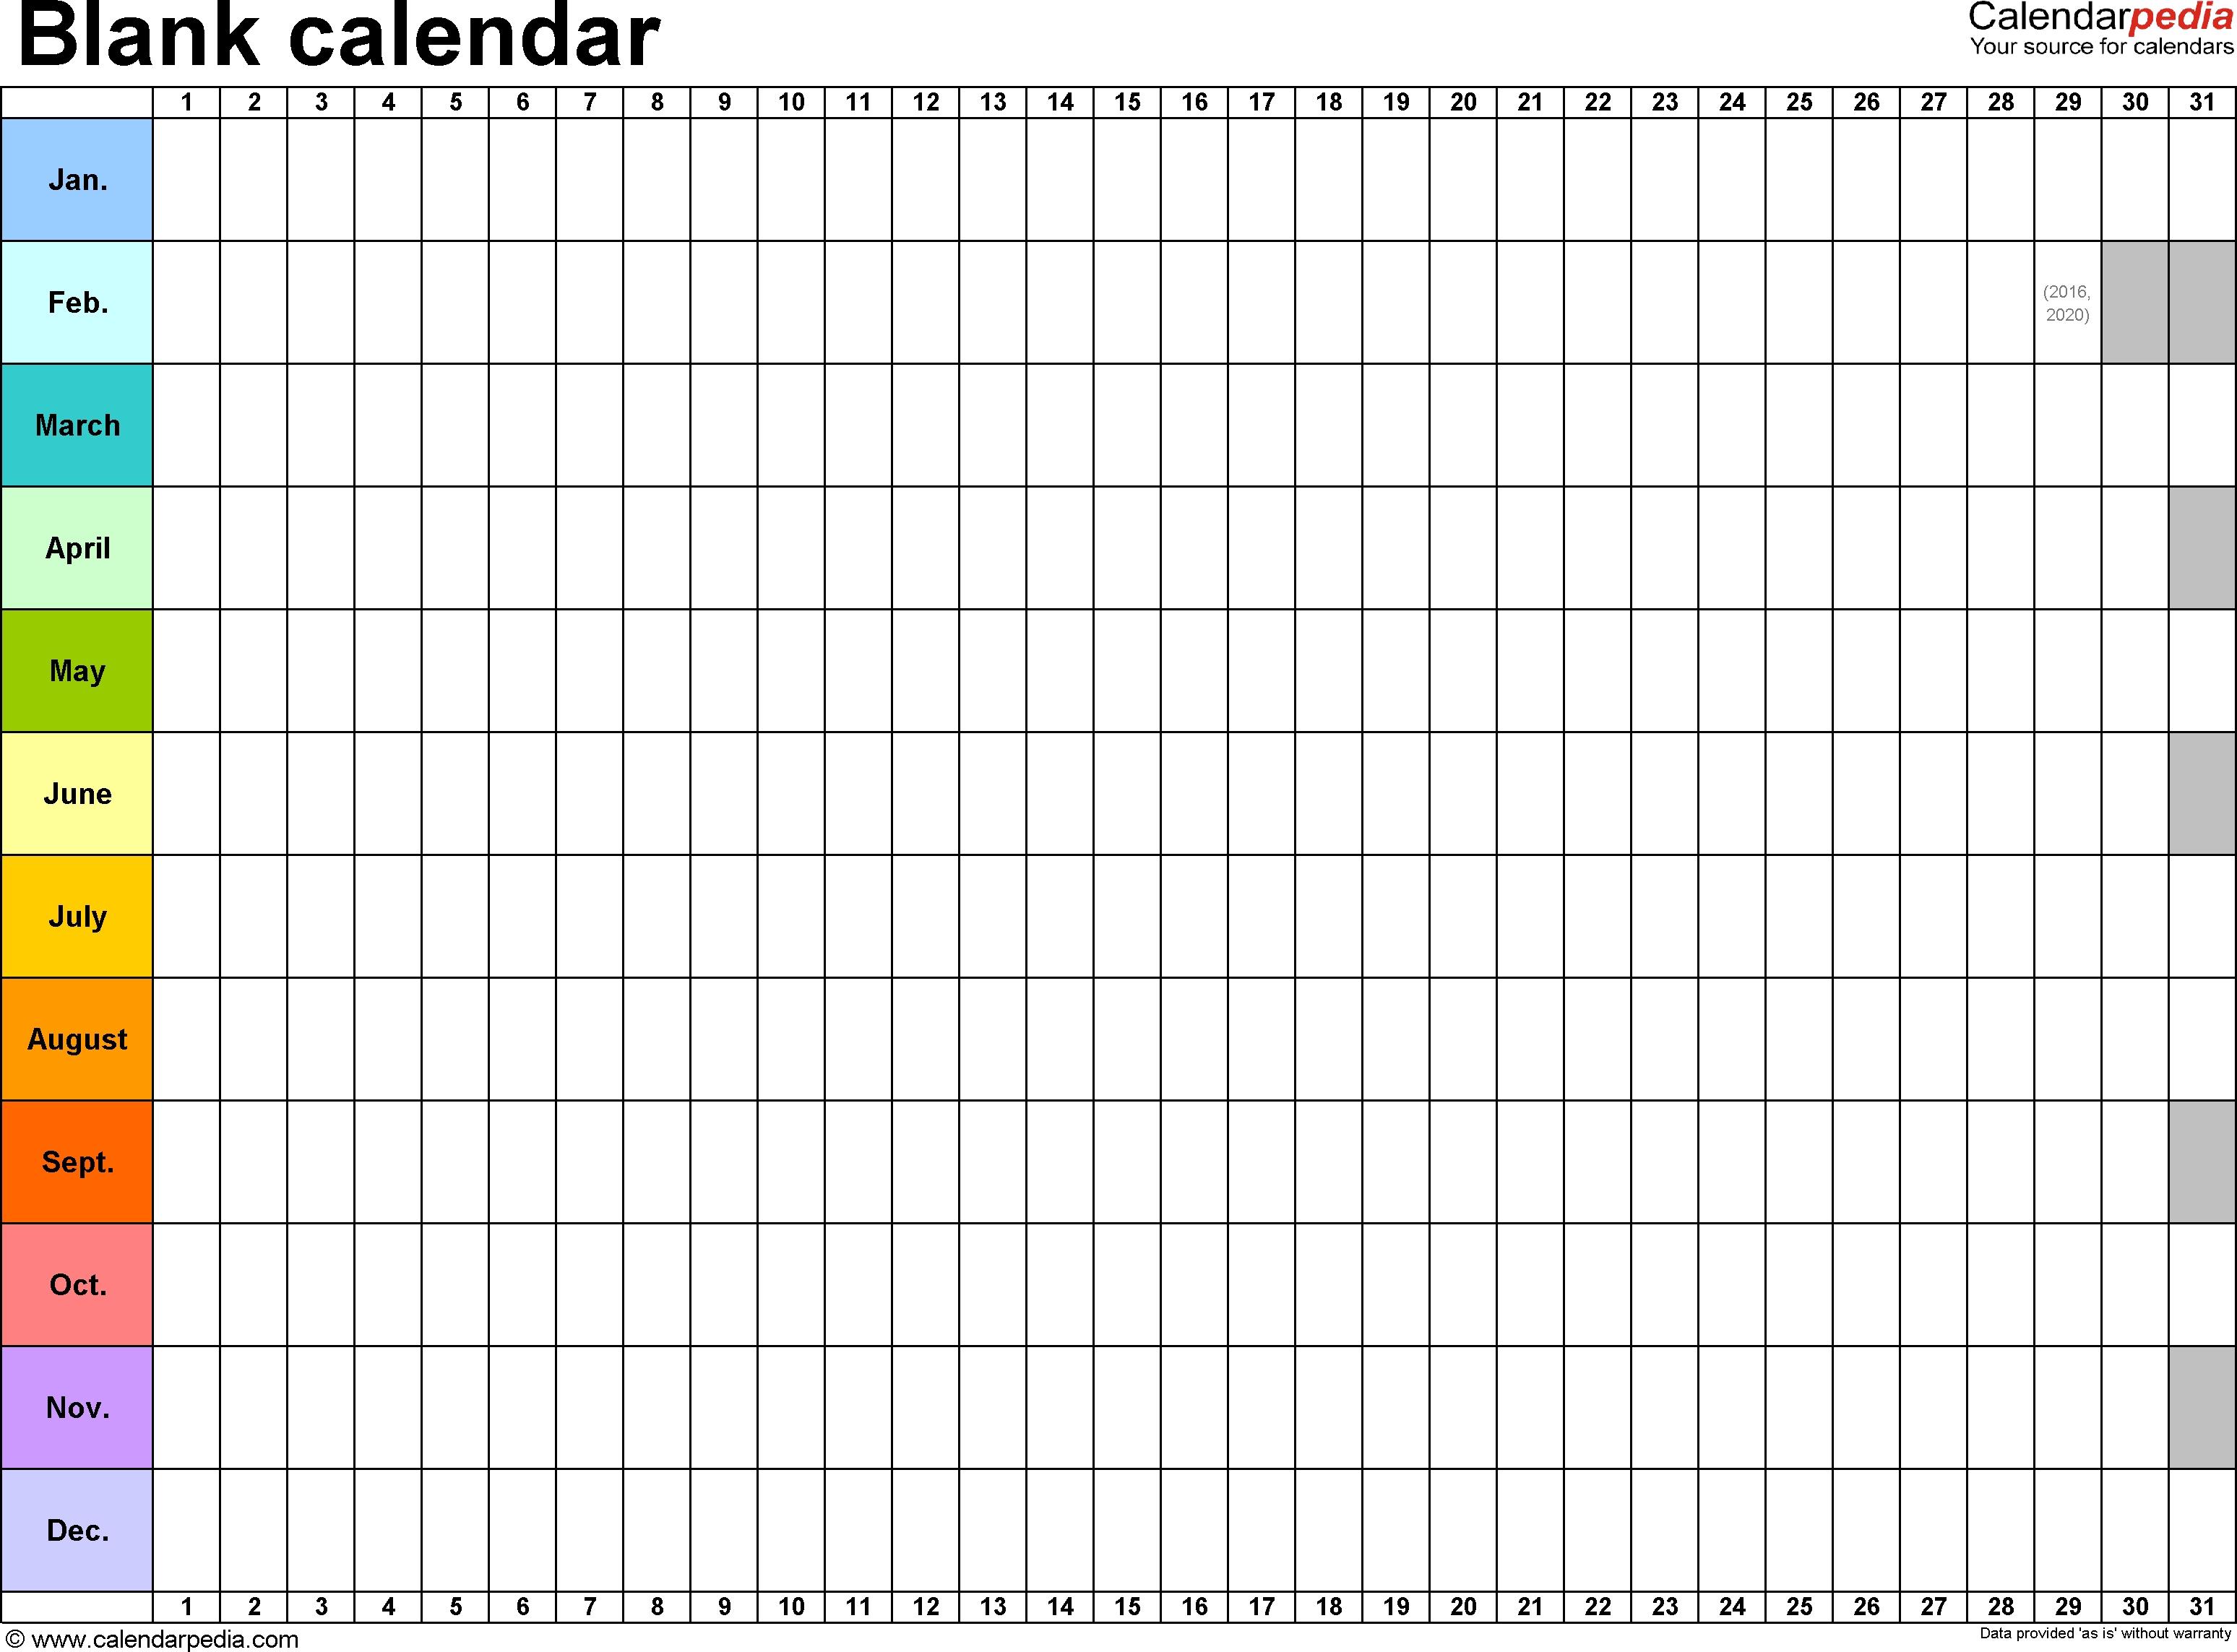 Template 2: Excel Template For Blank Calendar (Landscape Orientation intended for Annual Calendar Planner Excel Spreadsheet